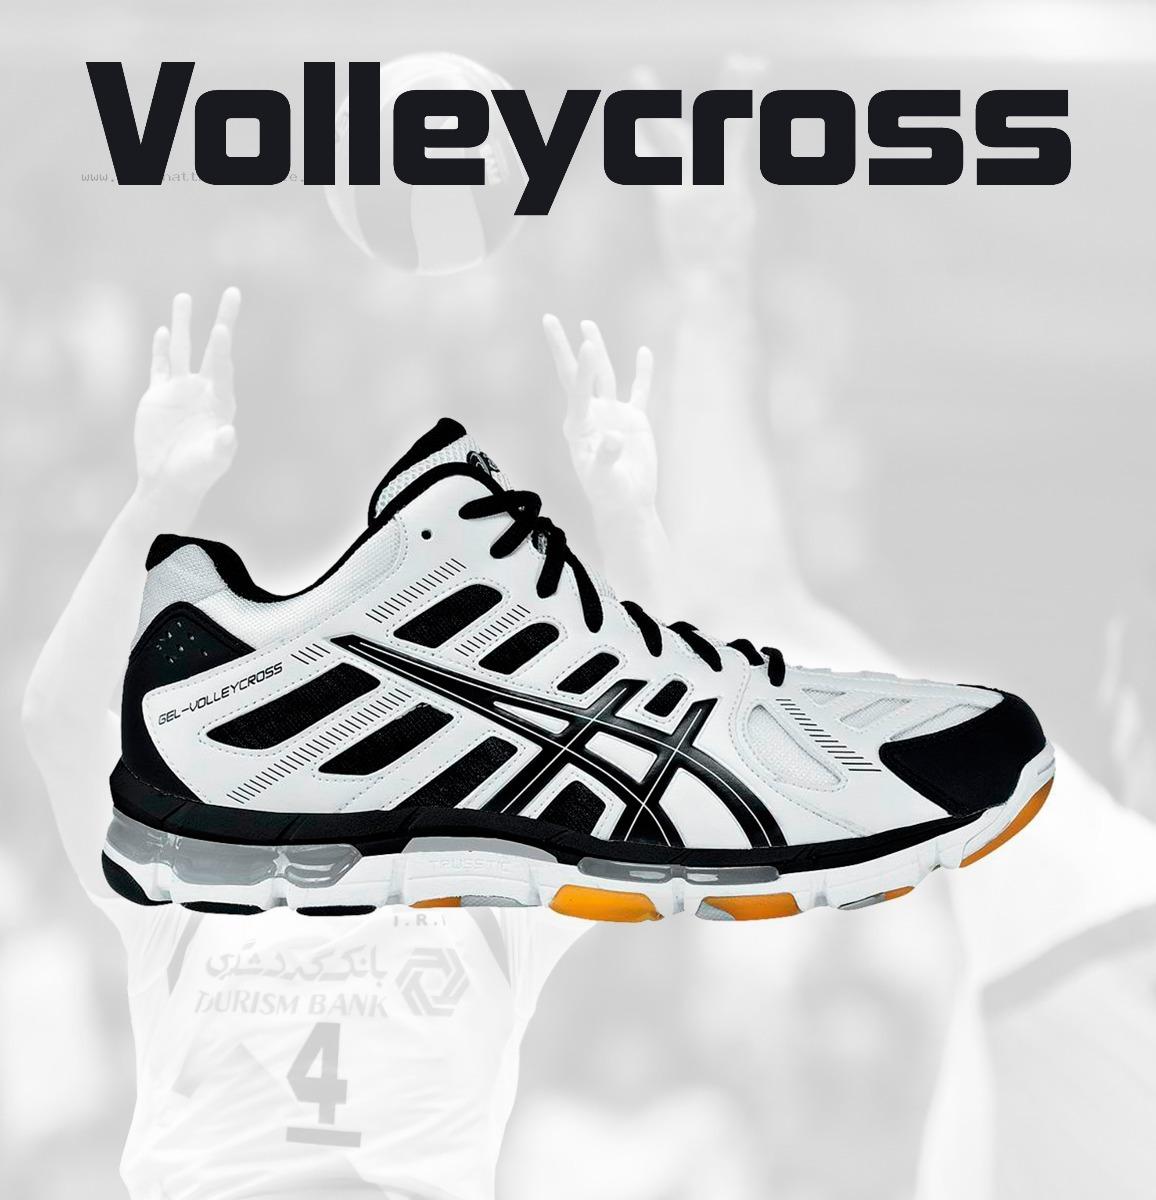 03f84c0c3eb8a asics gel volleycross revolution mt bota voleibol originales. Cargando zoom.